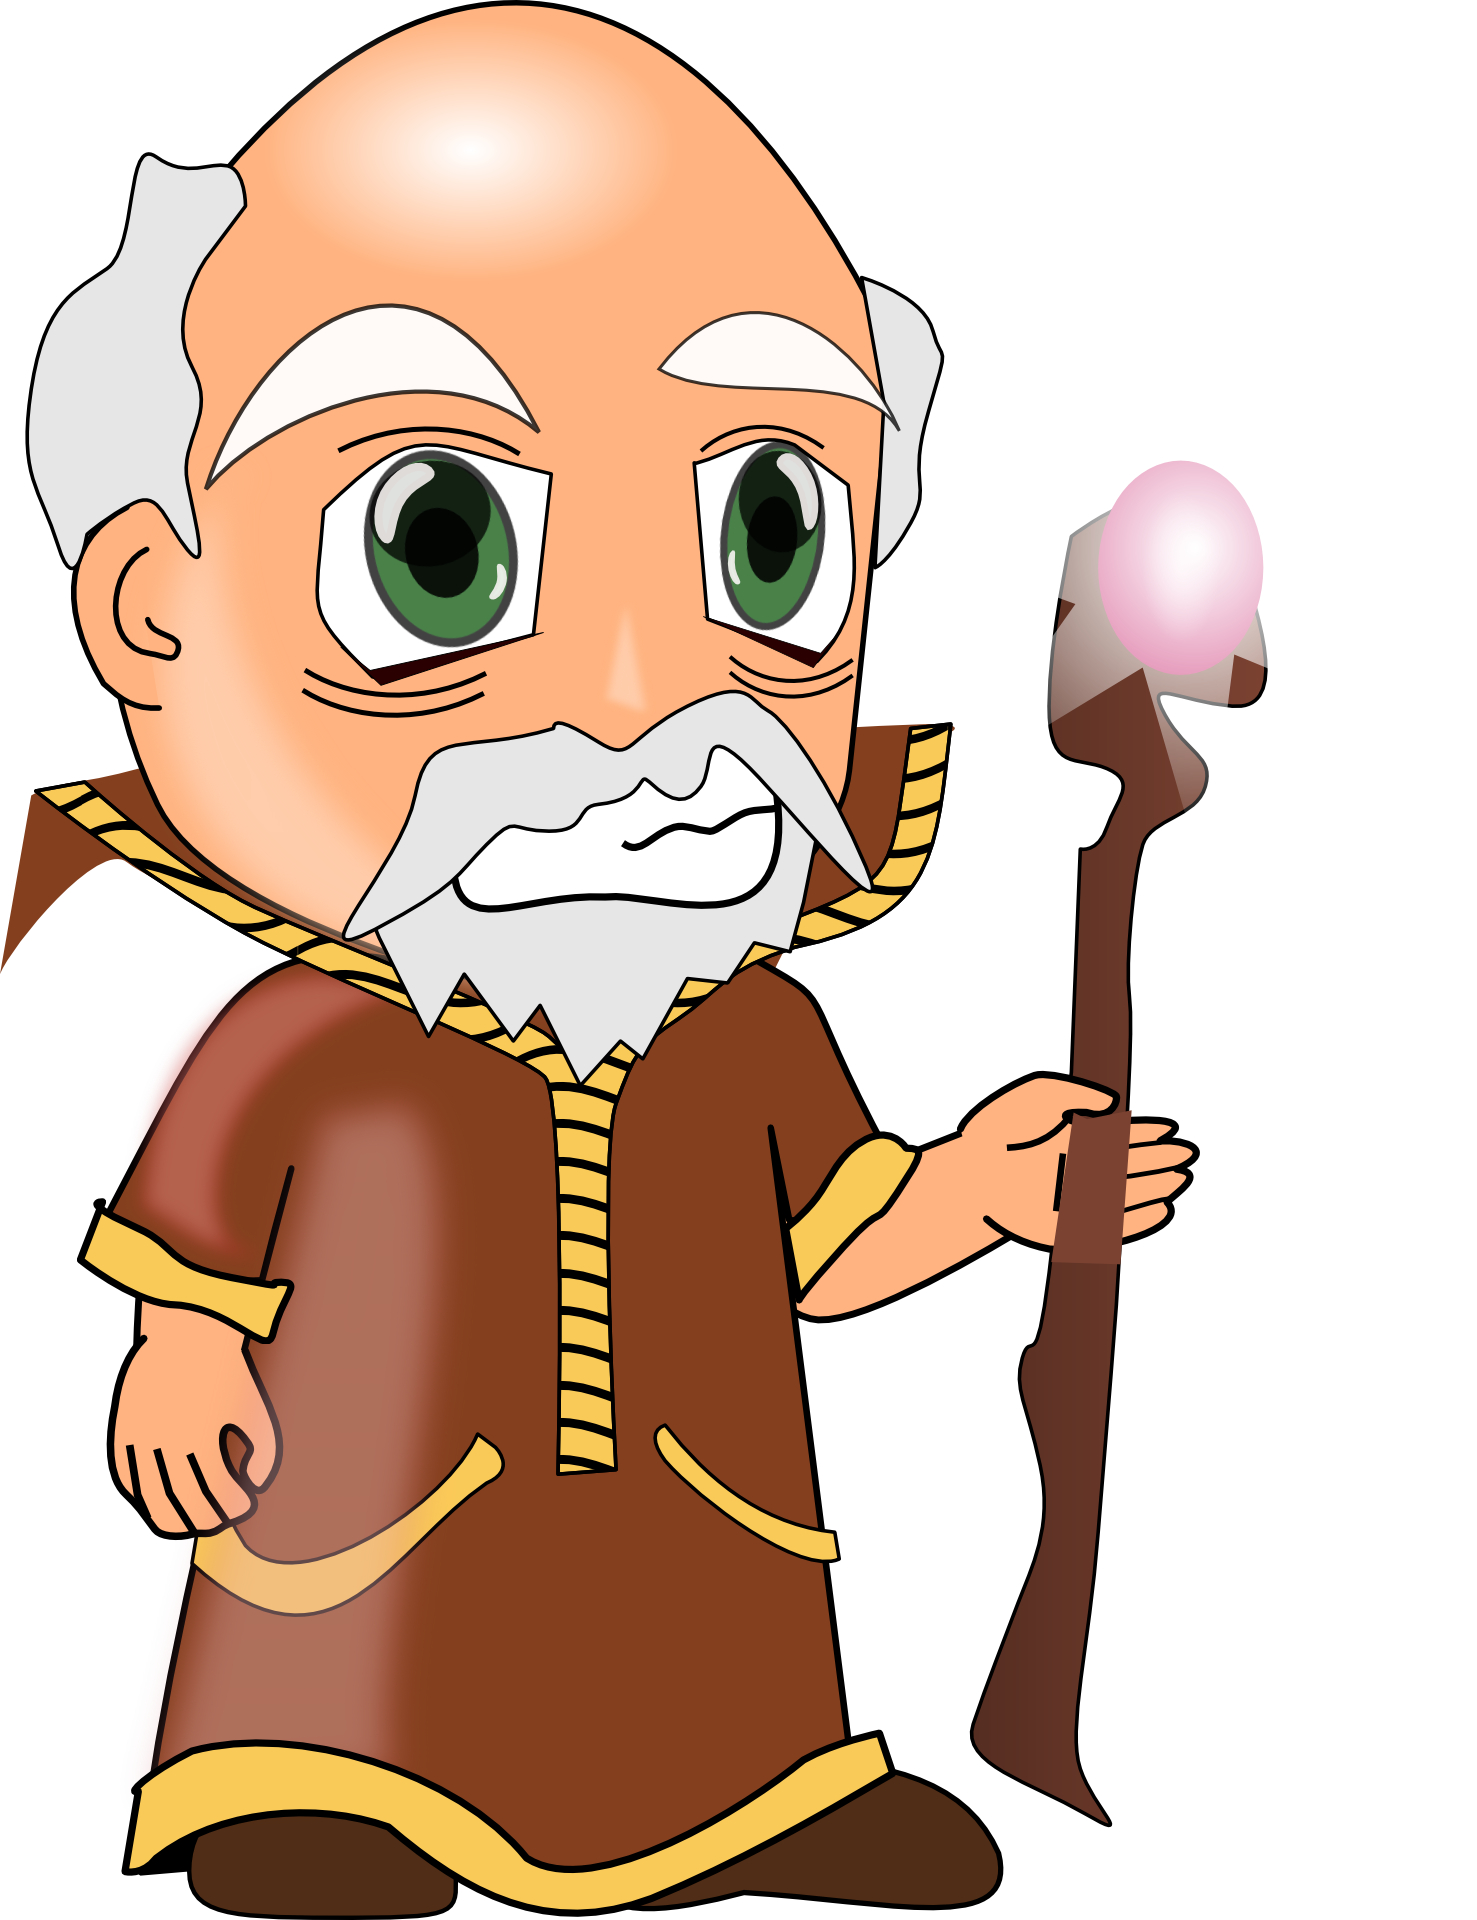 Cartoon people,wise old man vector.